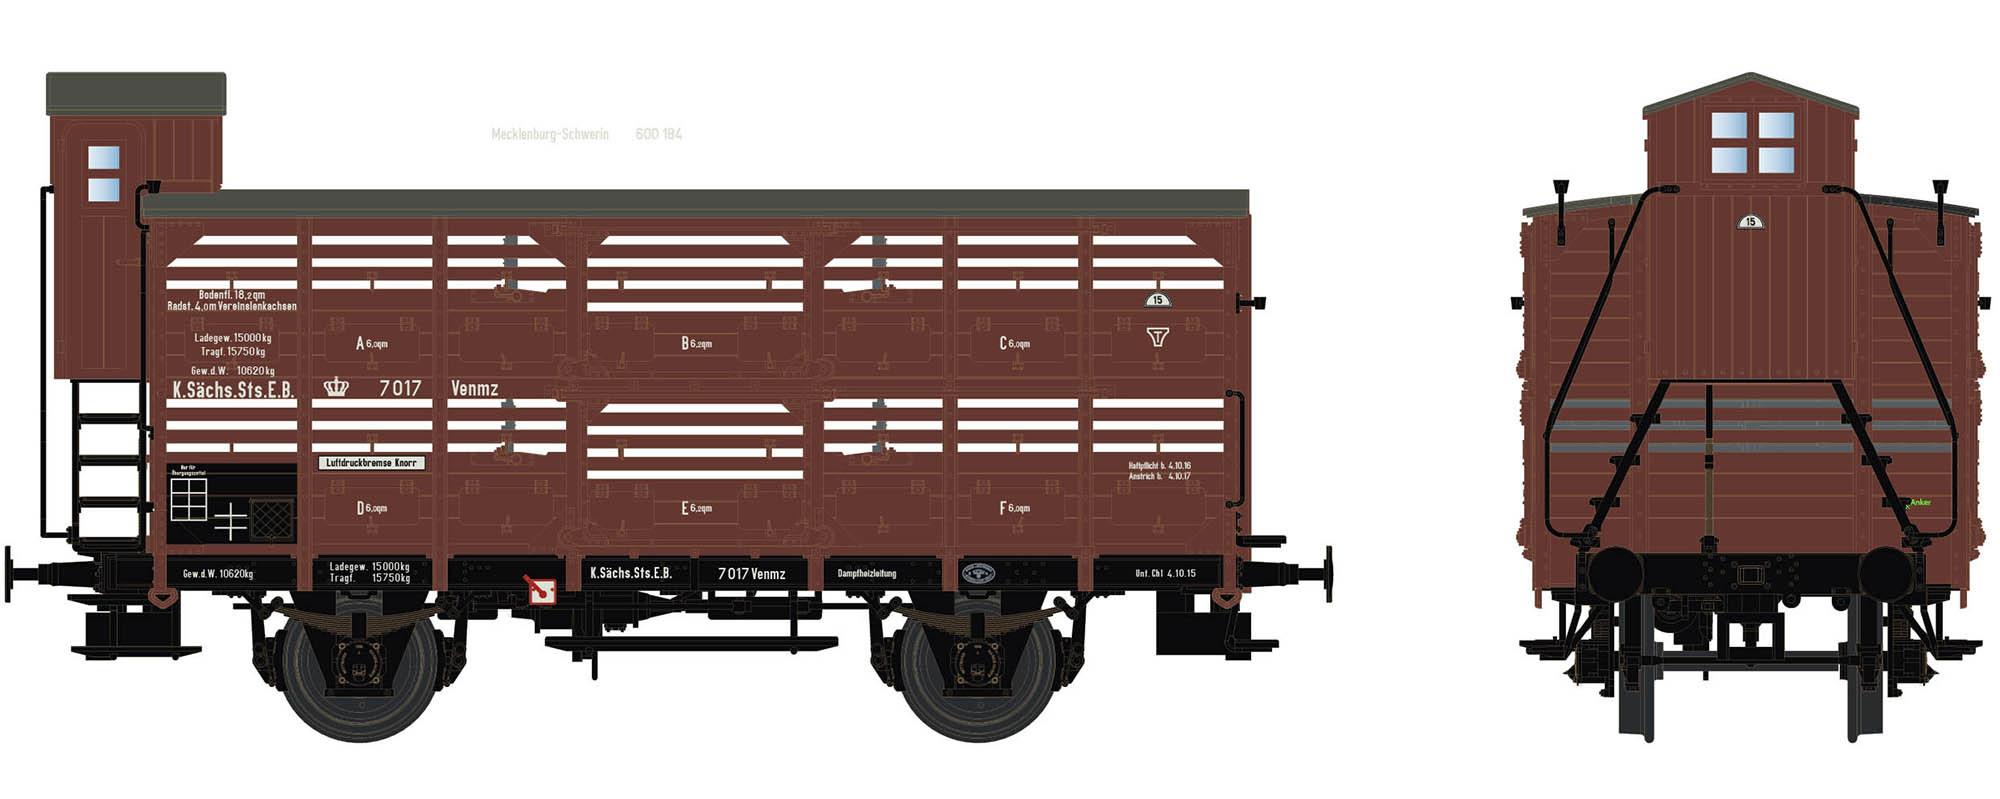 Wagenbausatz Verschlagwagen Vh14, K.Sächs.Sts.E.B., Epoche I